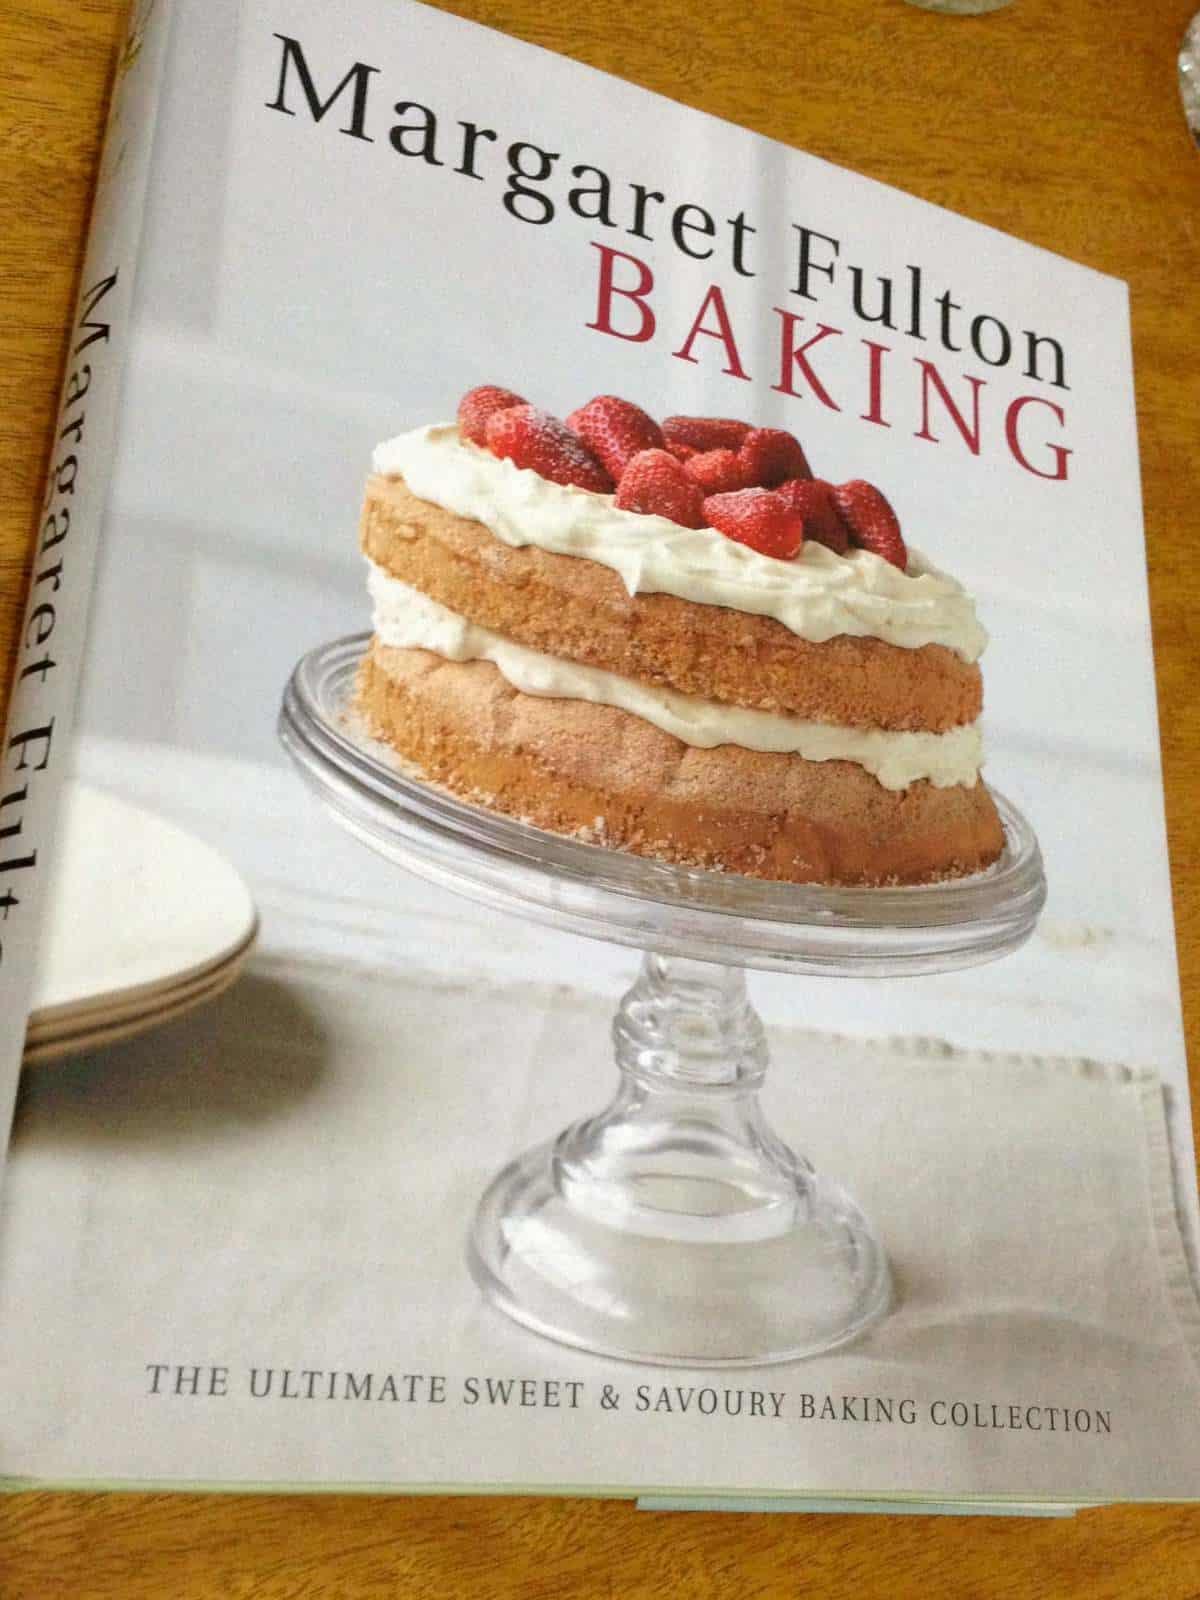 Margaret Fulton - Australian Baking Royalty